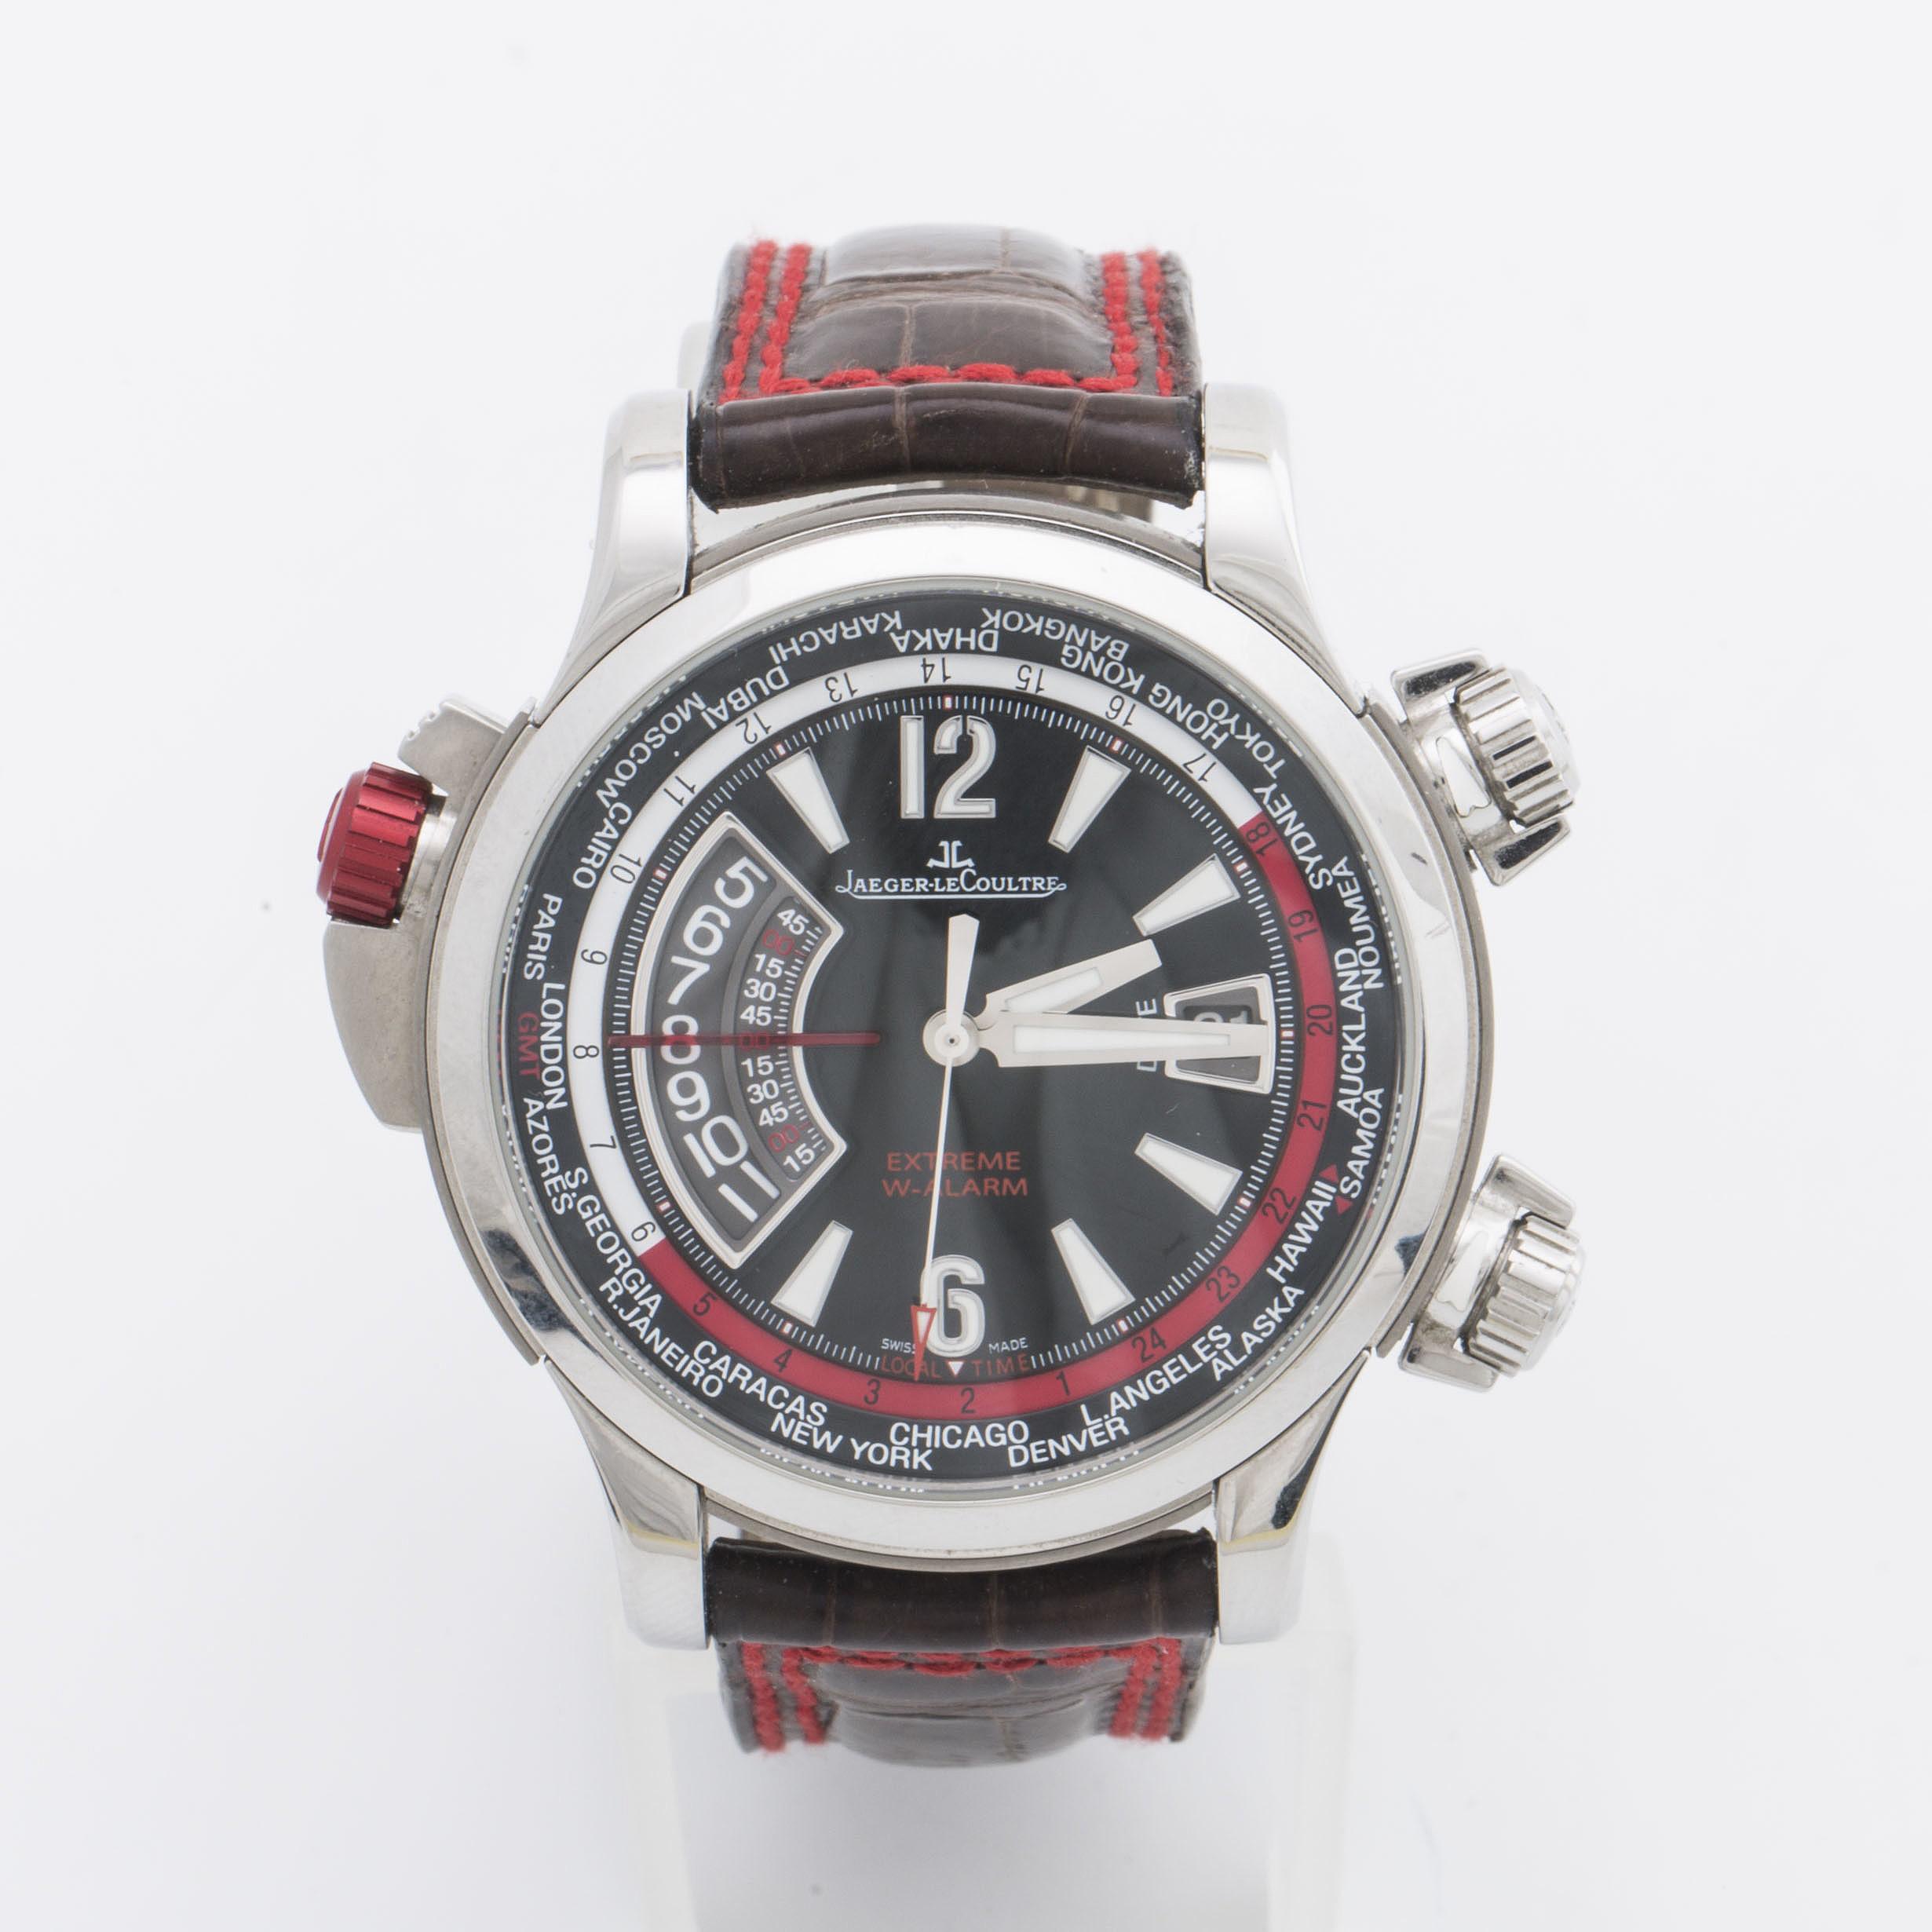 JAEGER-LECOULTRE, Master Compressor, Extreme W-Alarm, wristwatch, 46